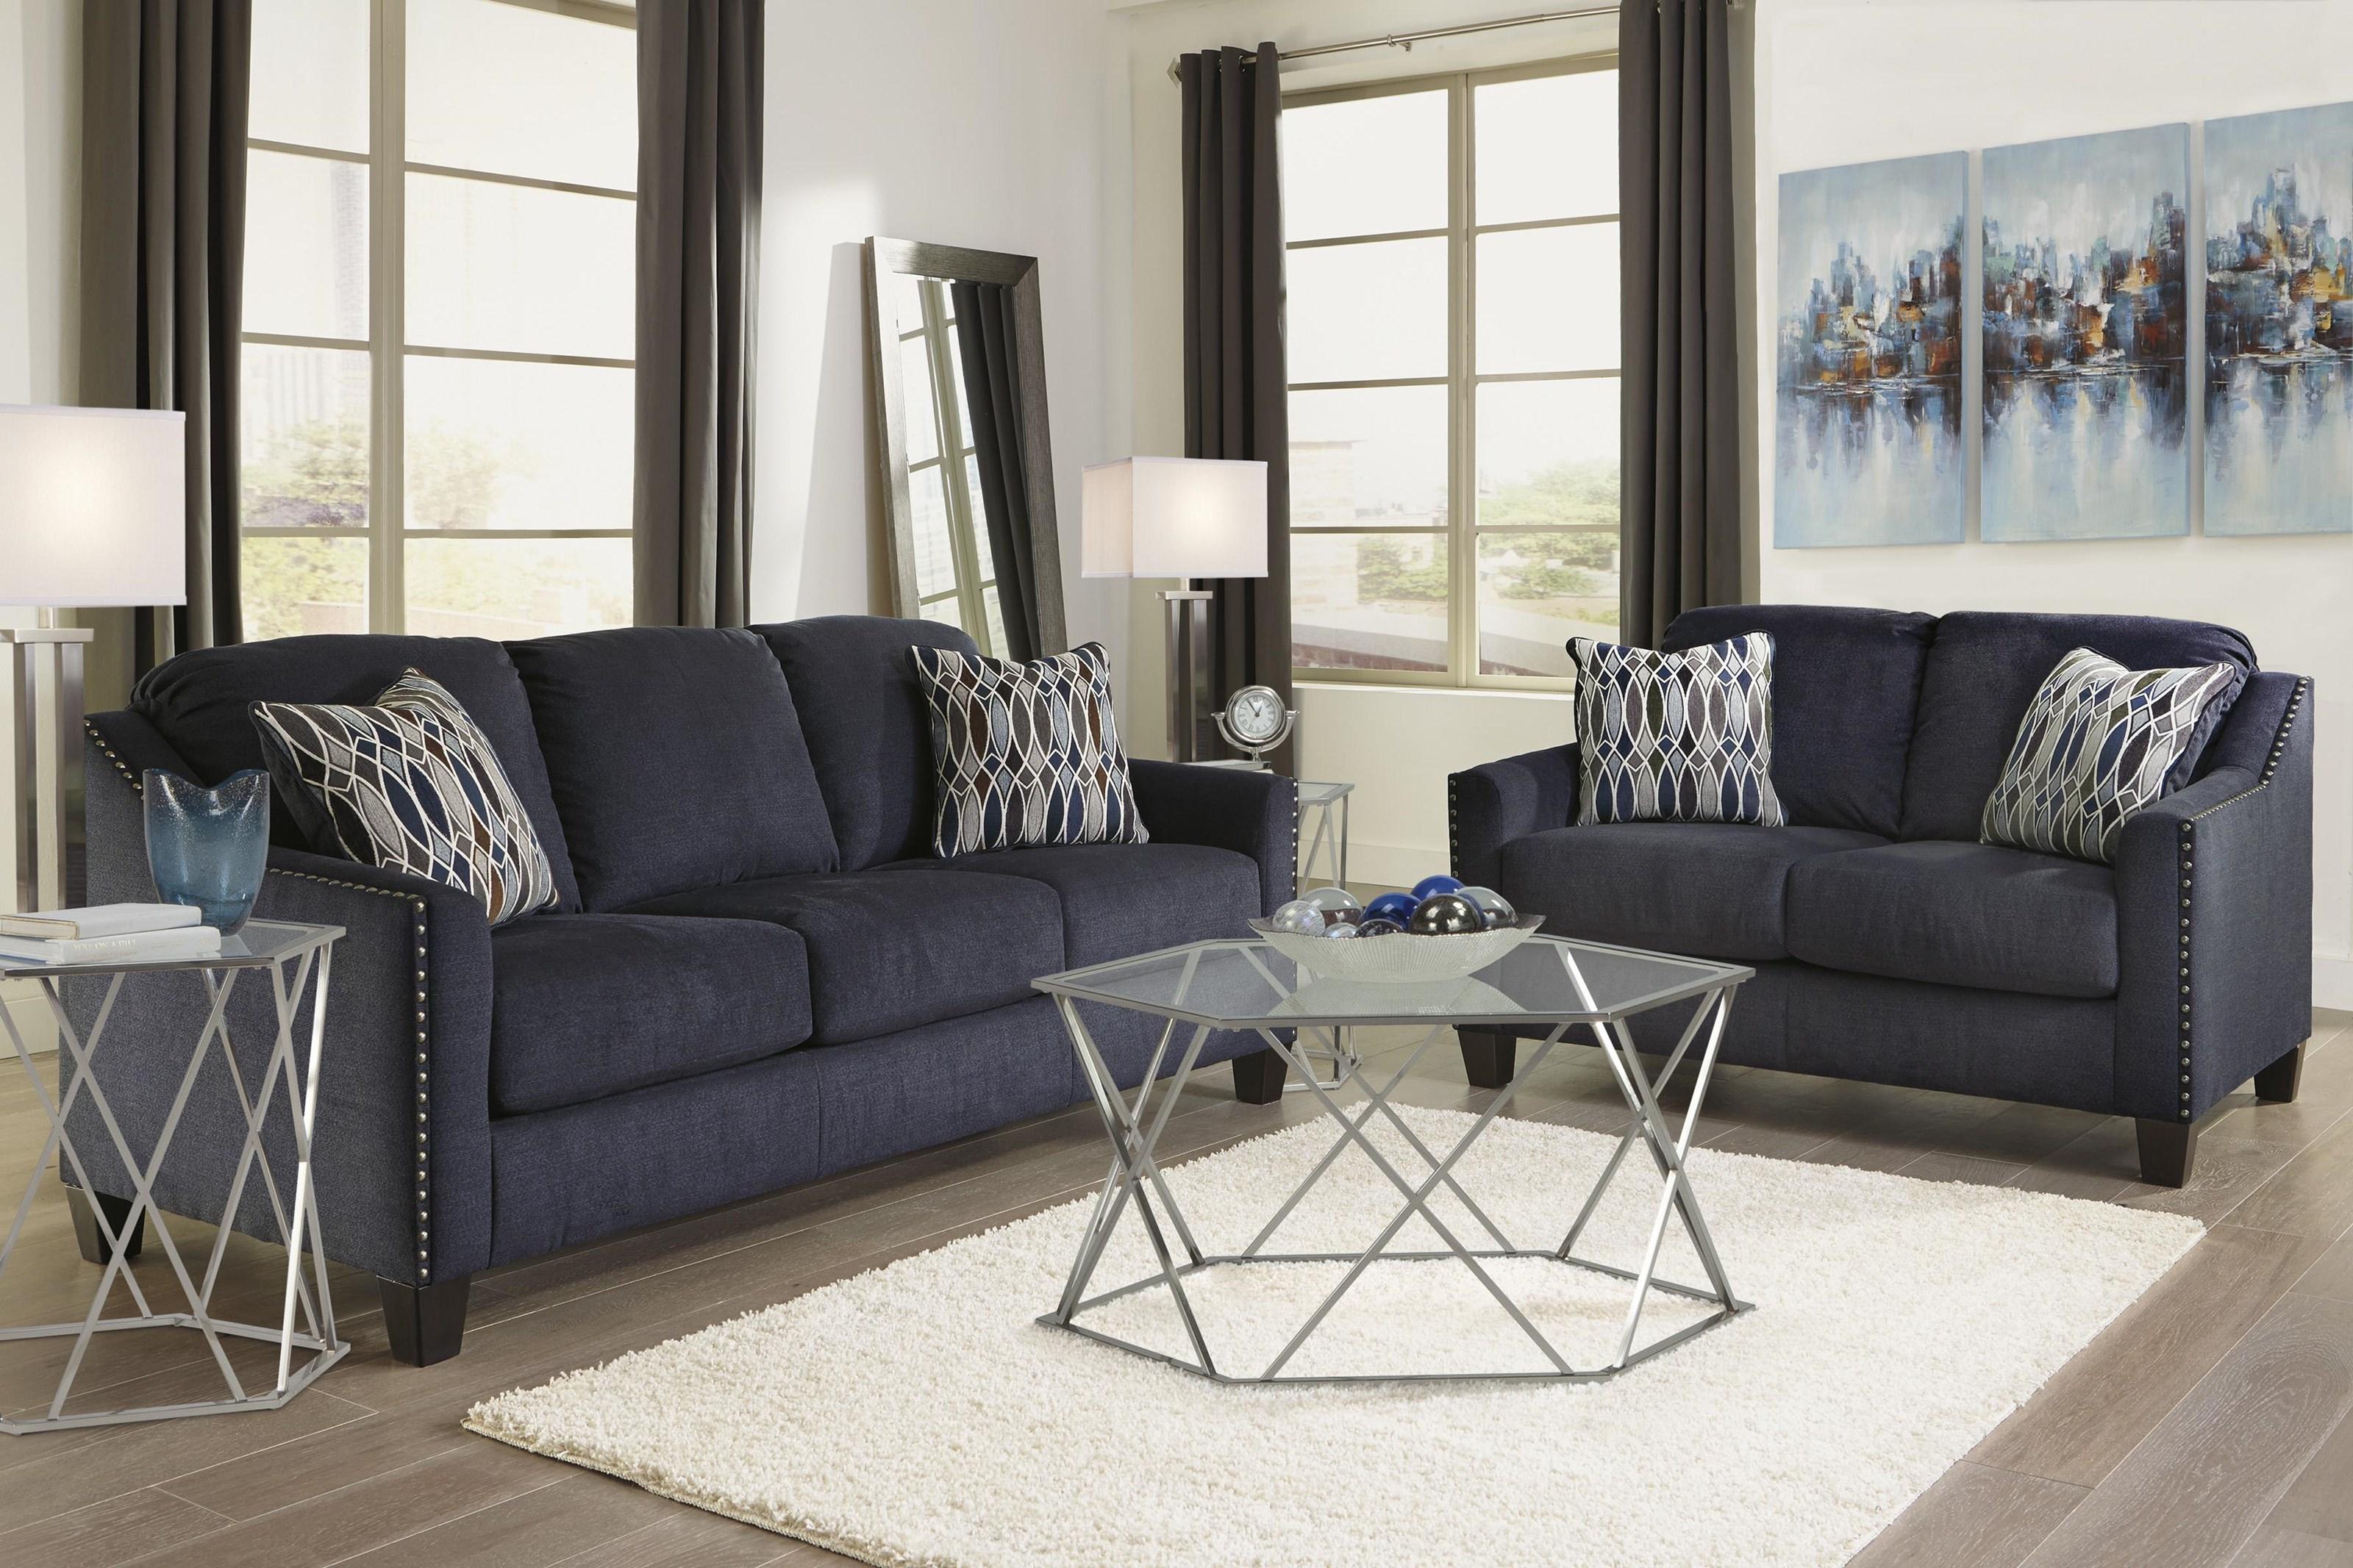 Benchcraft Creeal Heights 8020238 35 20 21 Ink Sofa